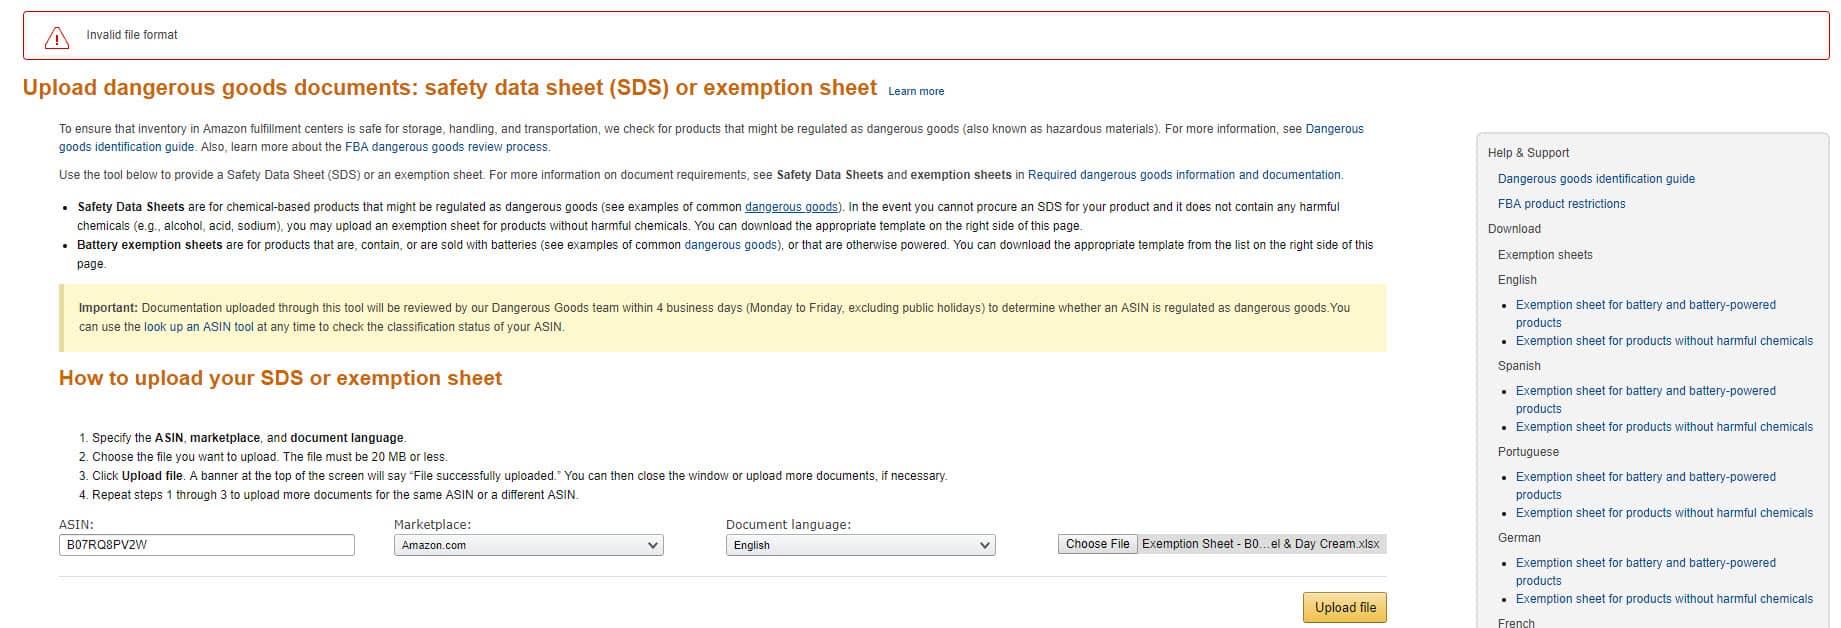 exemption sheet invalid file format amazon seller central hazmat dangerous goods upload error